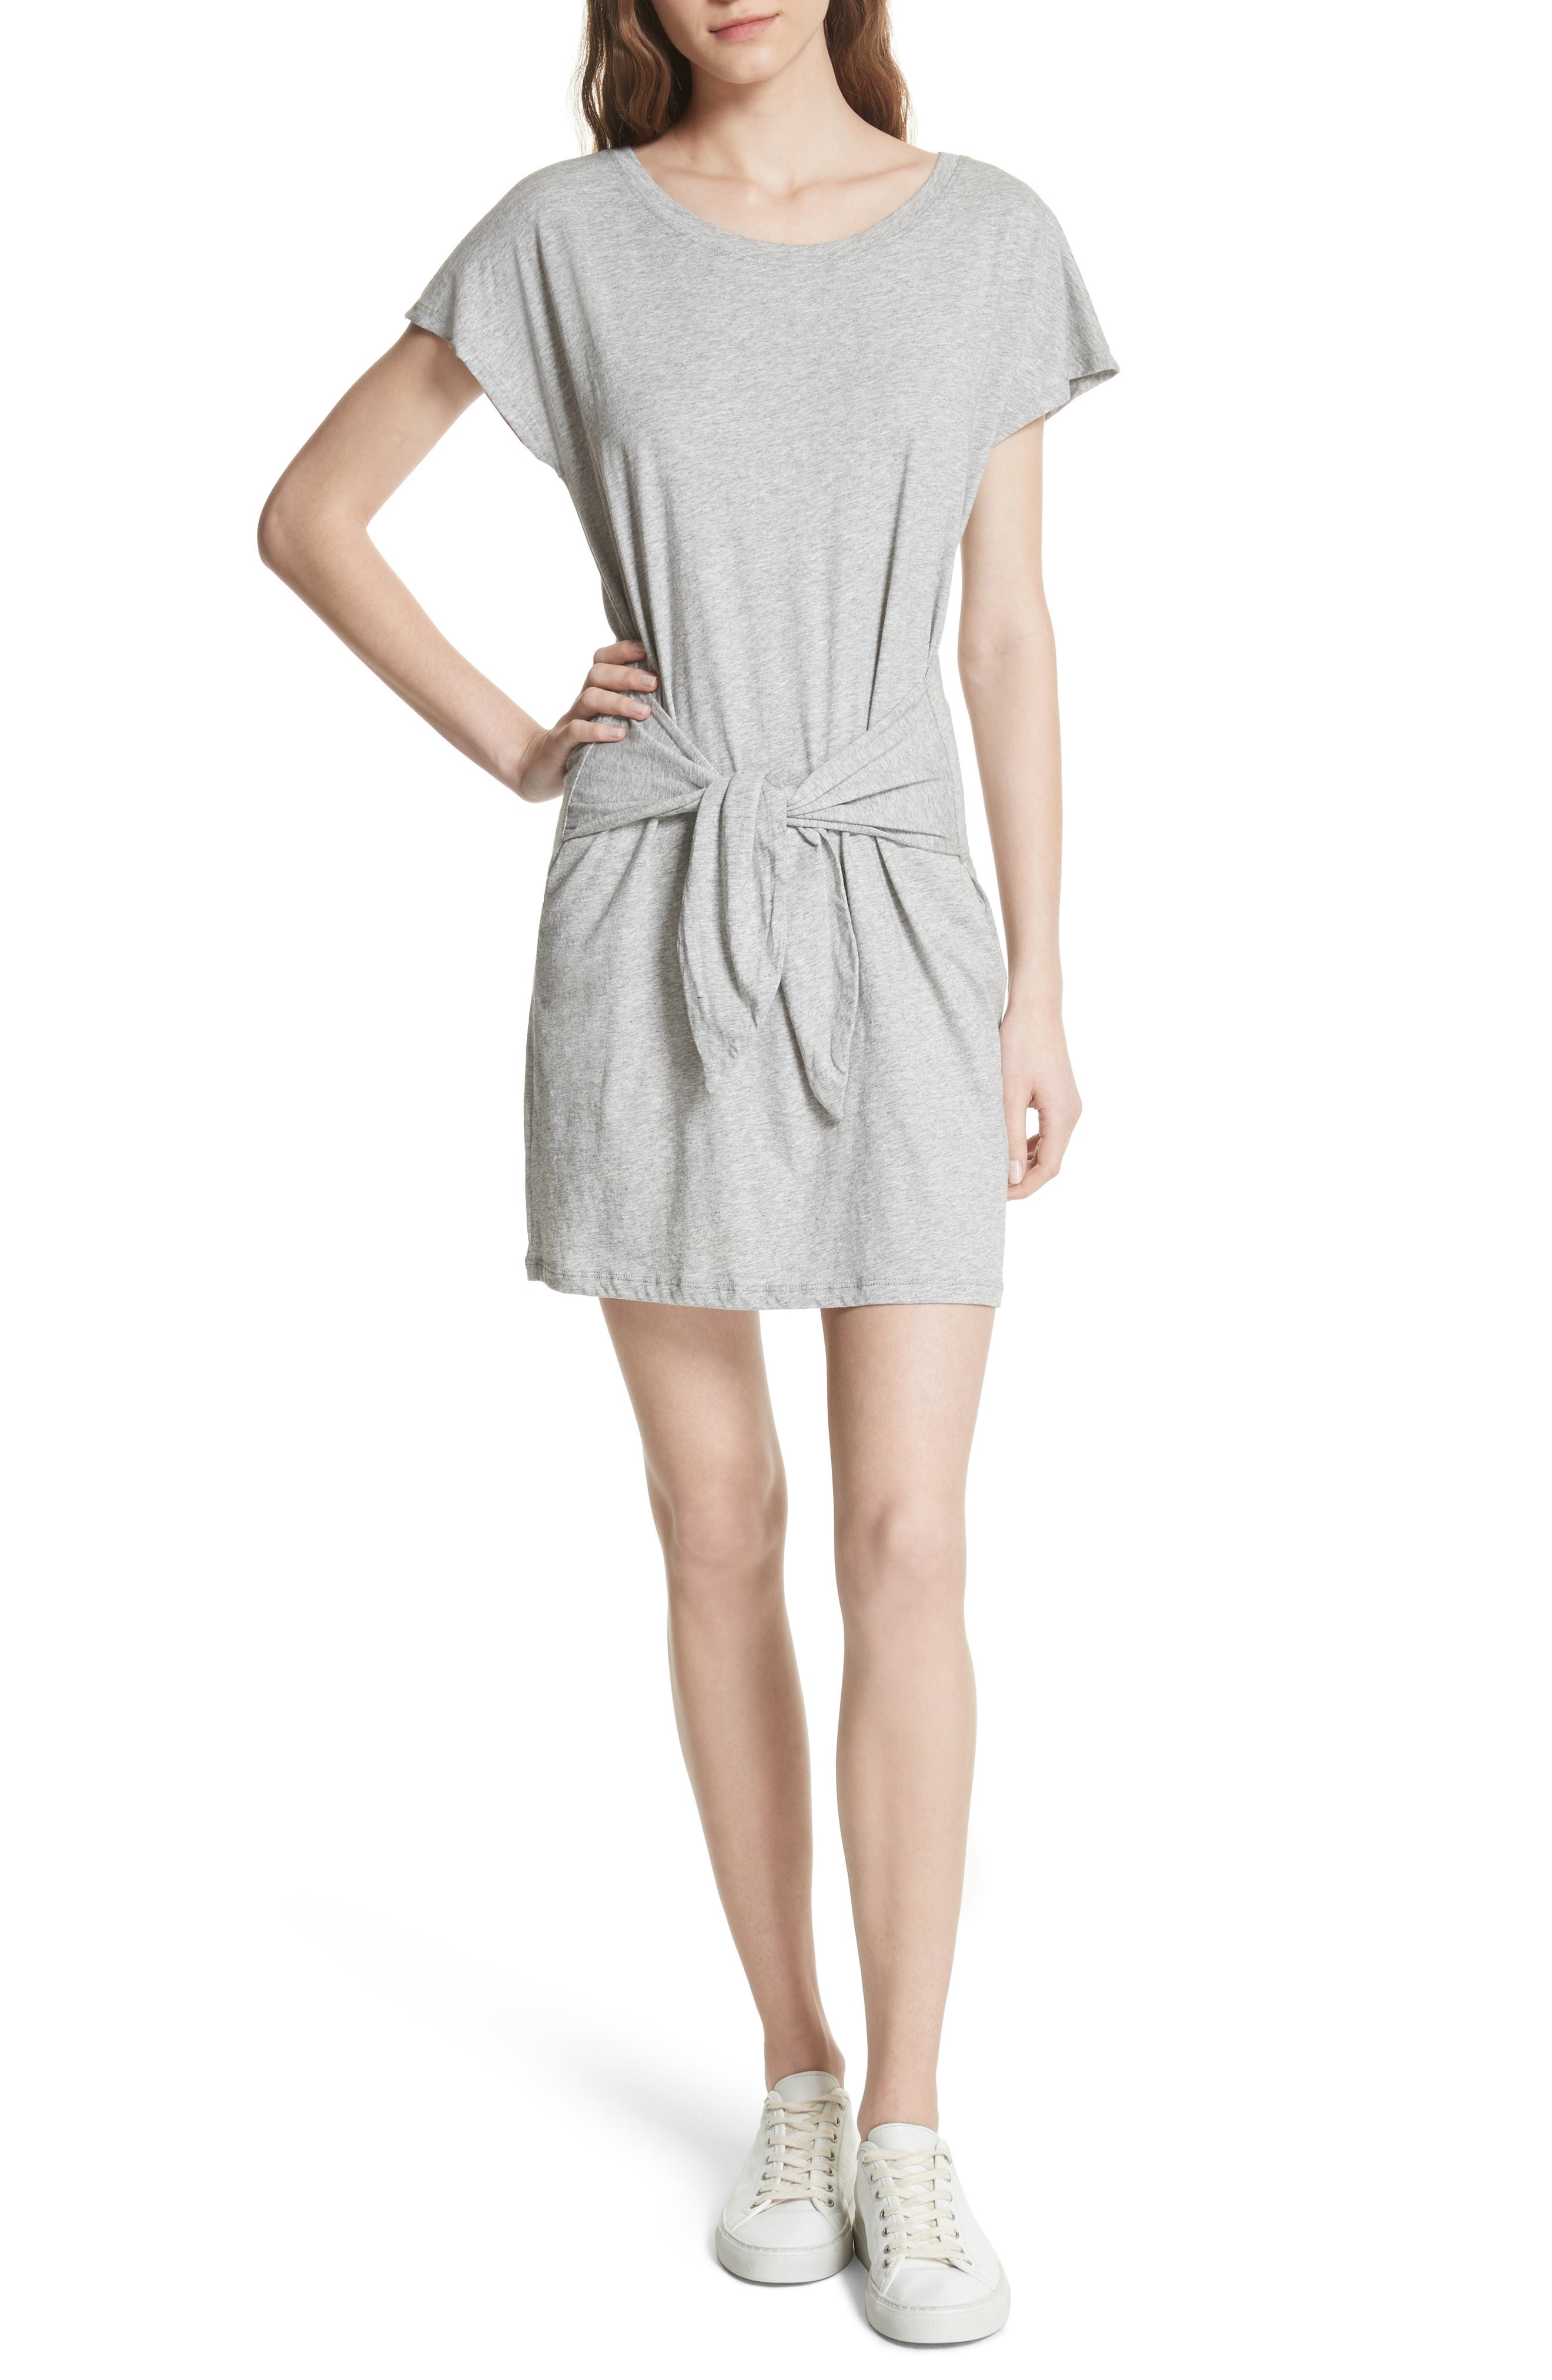 Alyra Tie Waist Cotton T-Shirt Dress,                             Alternate thumbnail 5, color,                             030